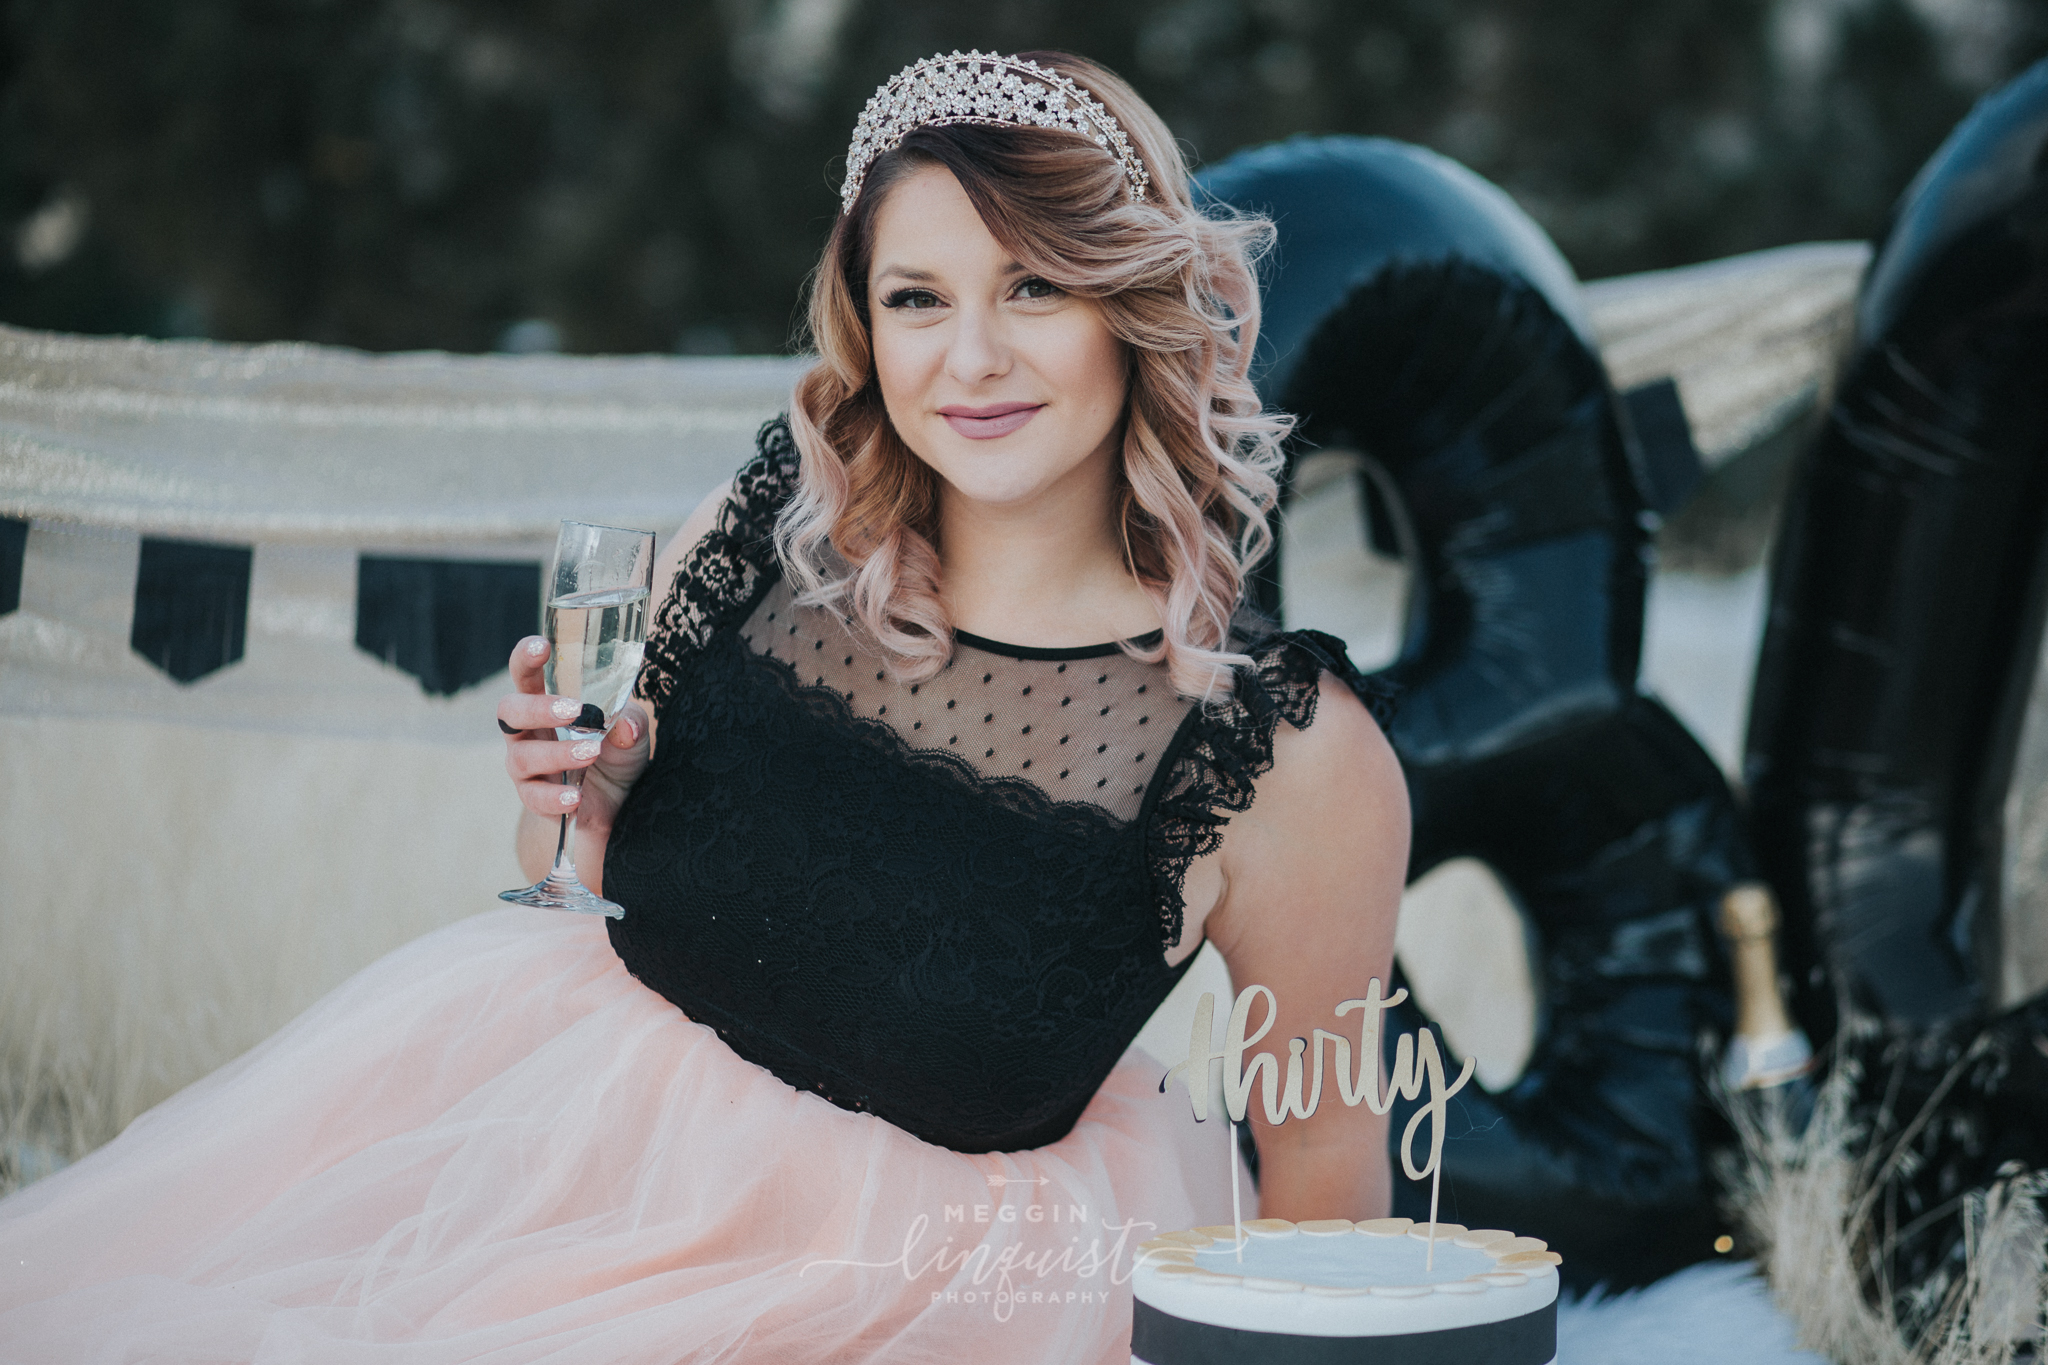 30th-birthday-cake-smash-reno-lake-tahoe-photographer-13.jpg